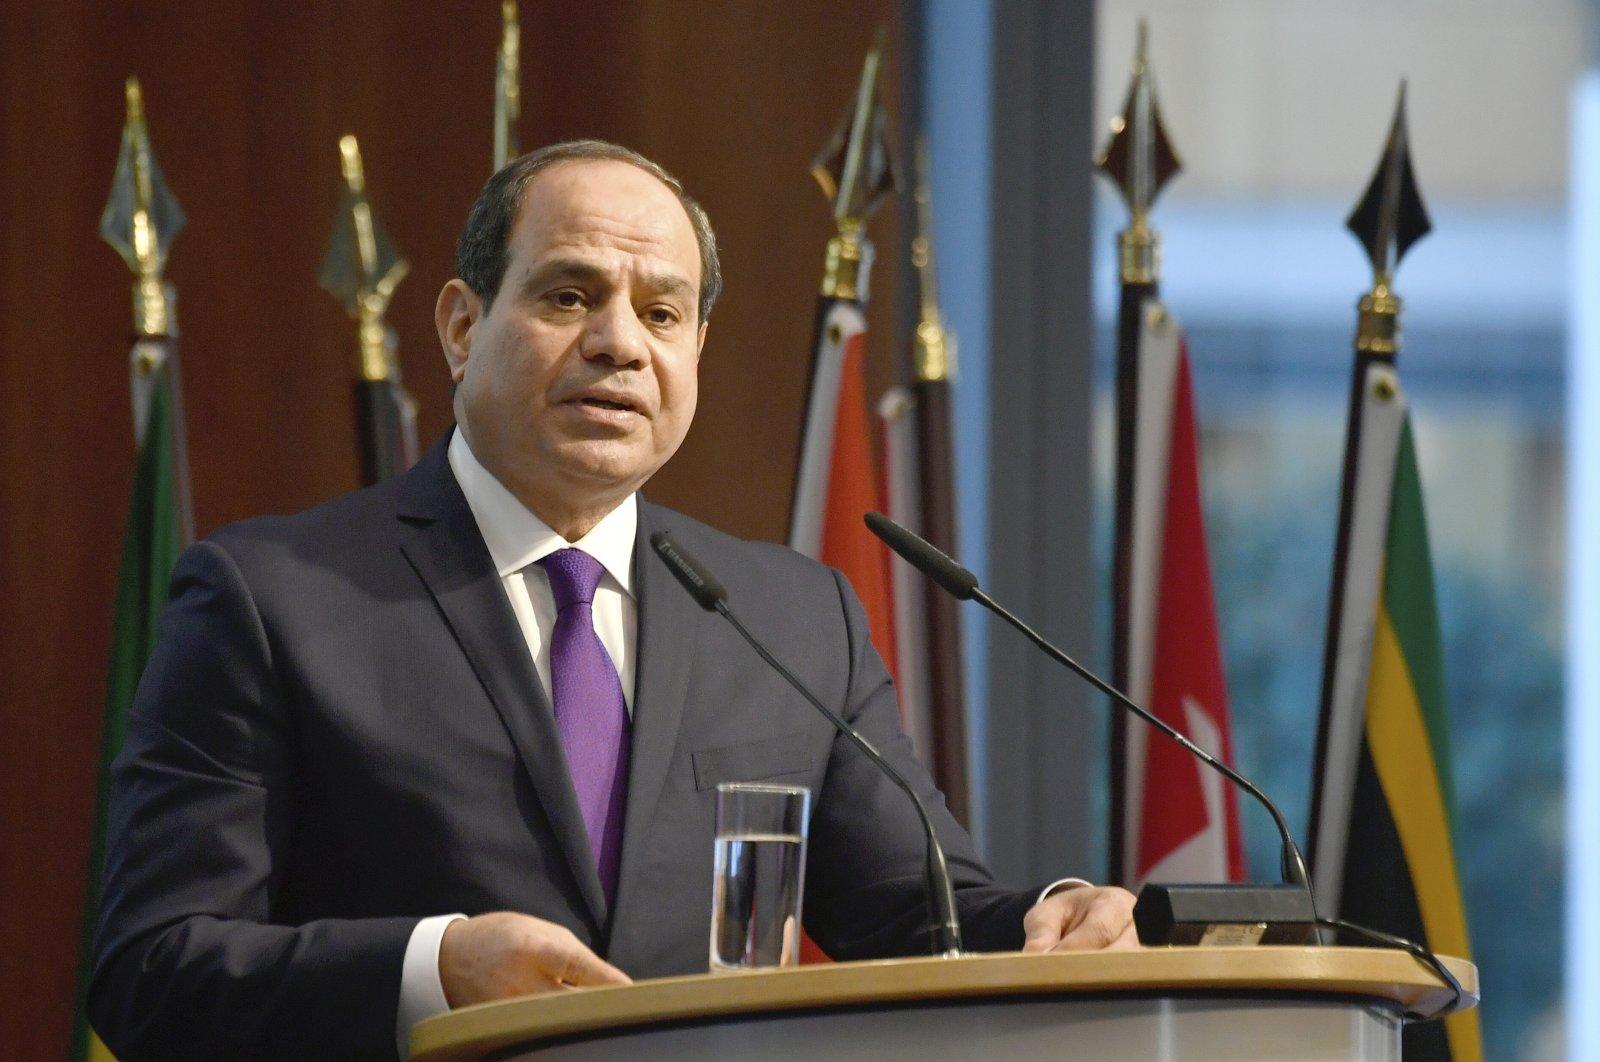 Egypt's President Abdel-Fattah el-Sissi speaks at the G-20 Investment Summit, Nov. 19, 2019. (AP Photo)